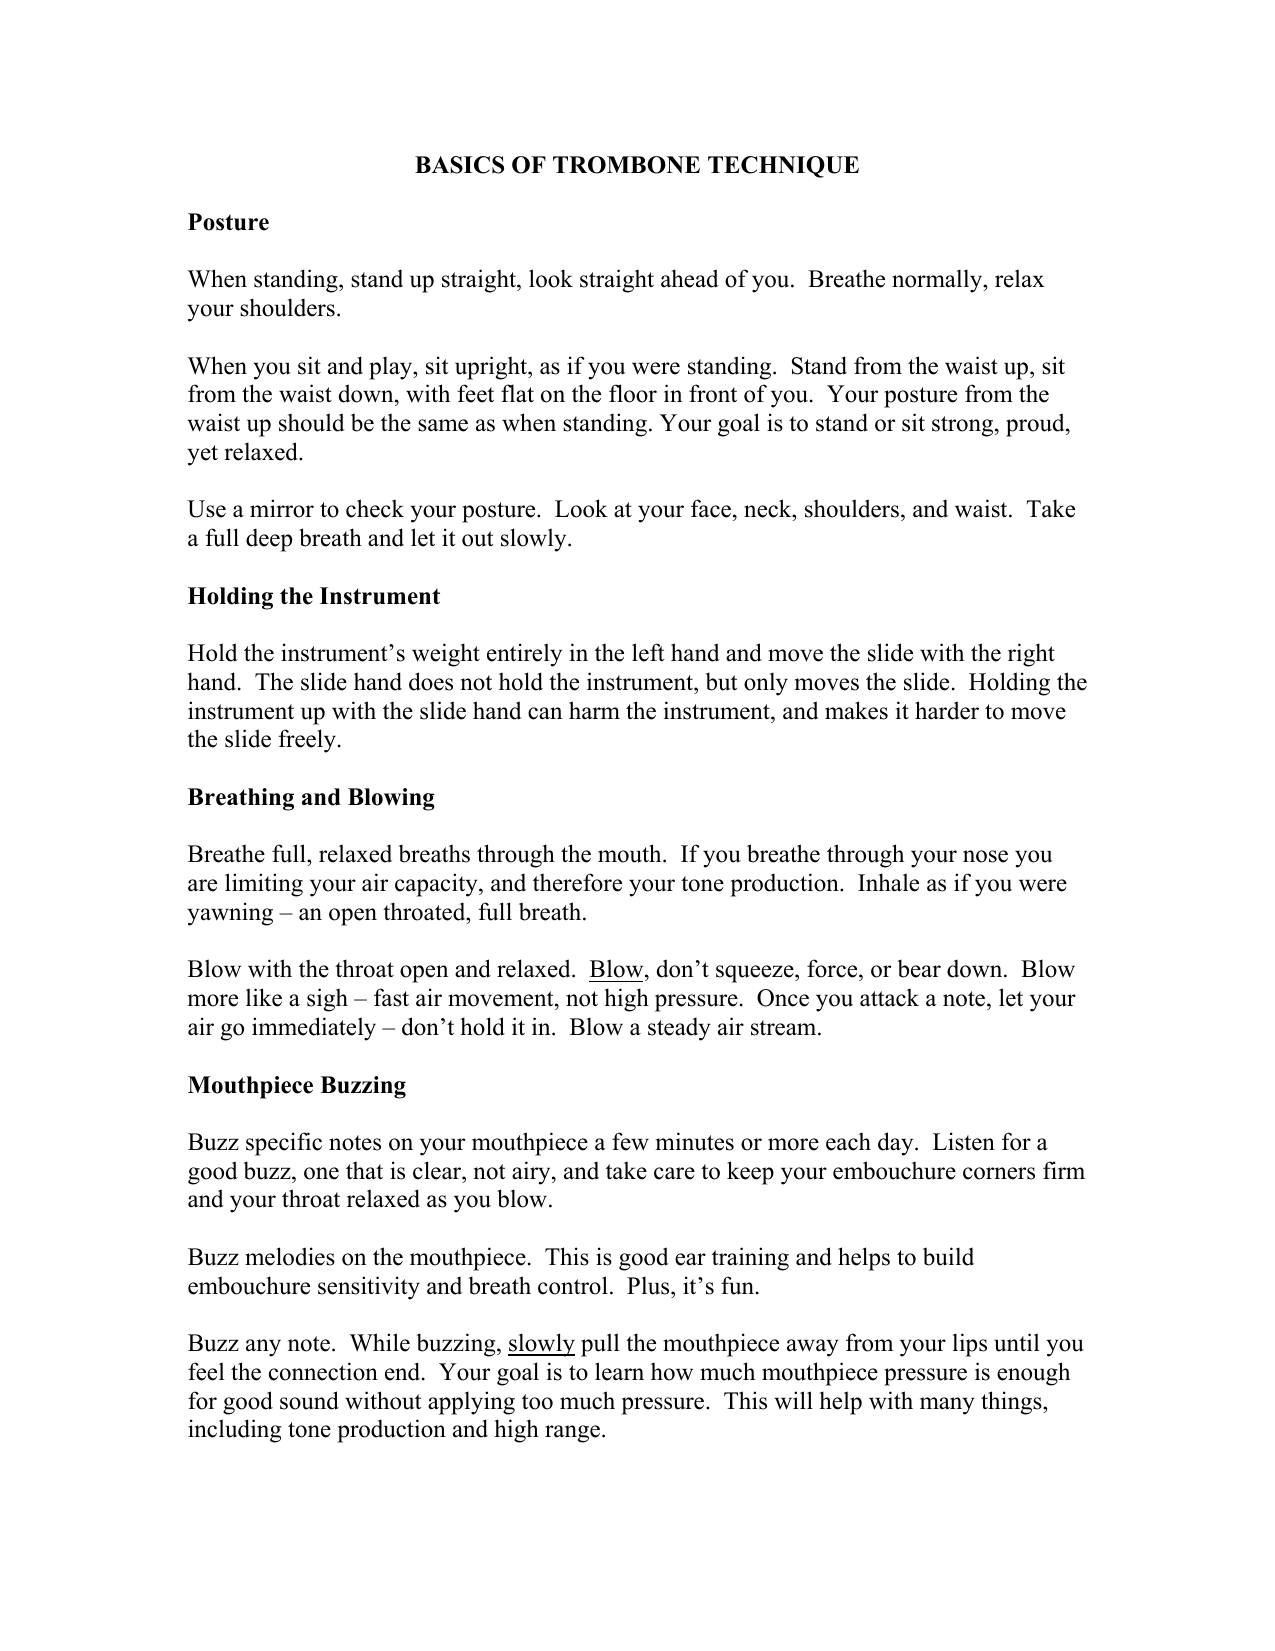 BASICS OF TROMBONE TECHNIQUE Posture